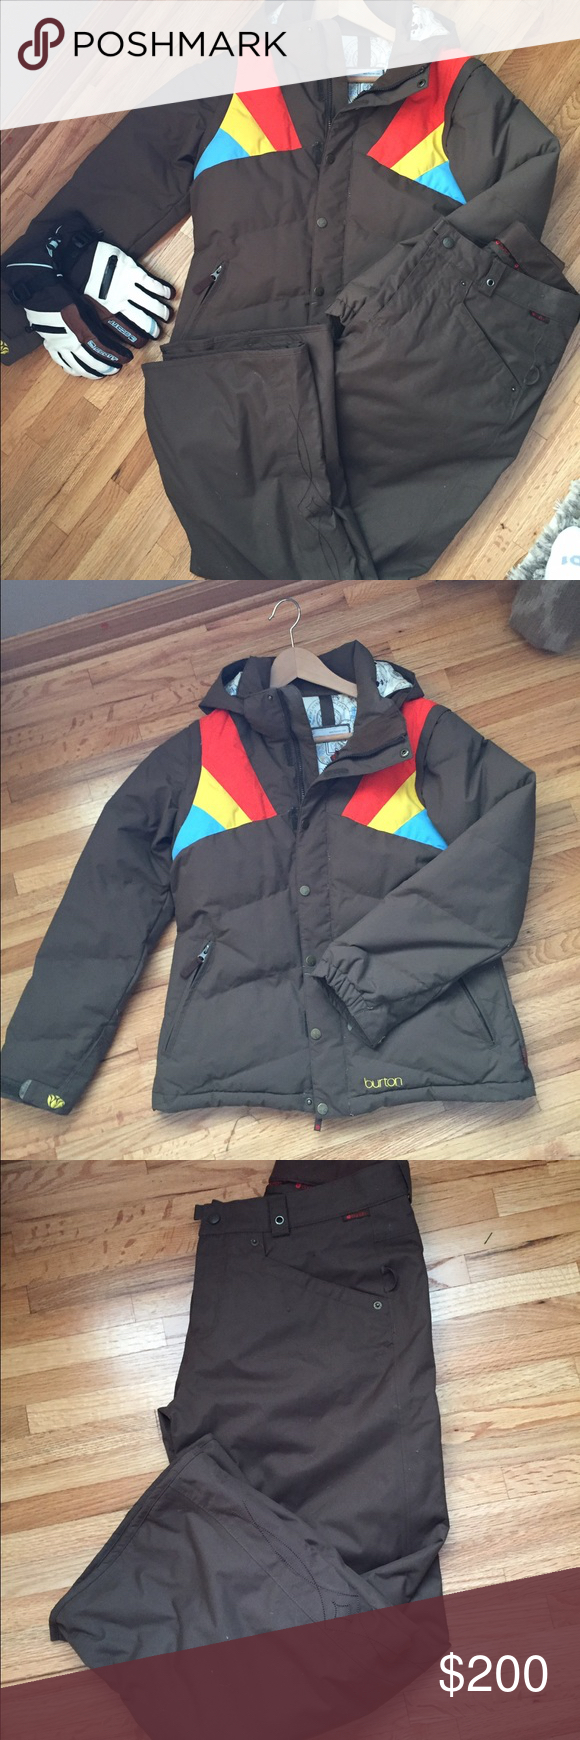 Selling this Burton Snowboarding Outfit on Poshmark! My username is: lmmartin09. #shopmycloset #poshmark #fashion #shopping #style #forsale #Burton #Jackets & Blazers